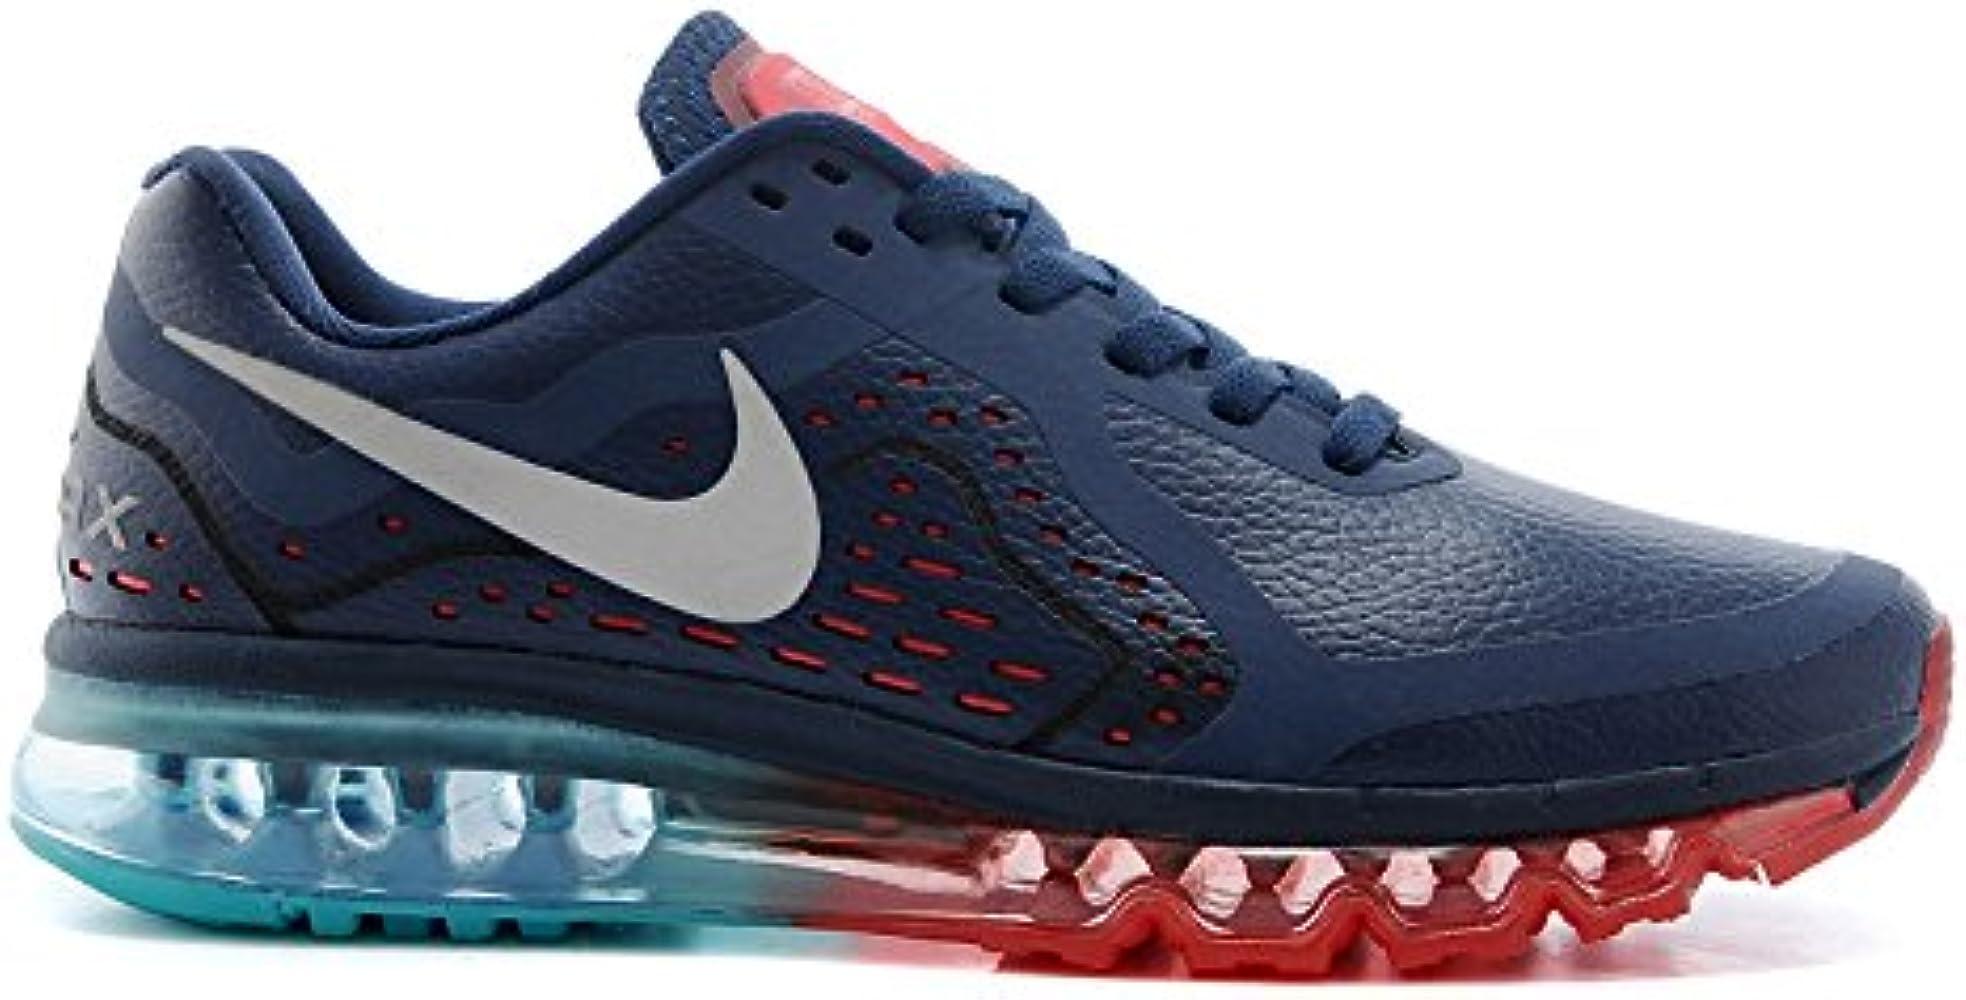 Nike Air Max 2014 Men's Running Shoes (USA 11) (UK 10) (EU EHMp8H